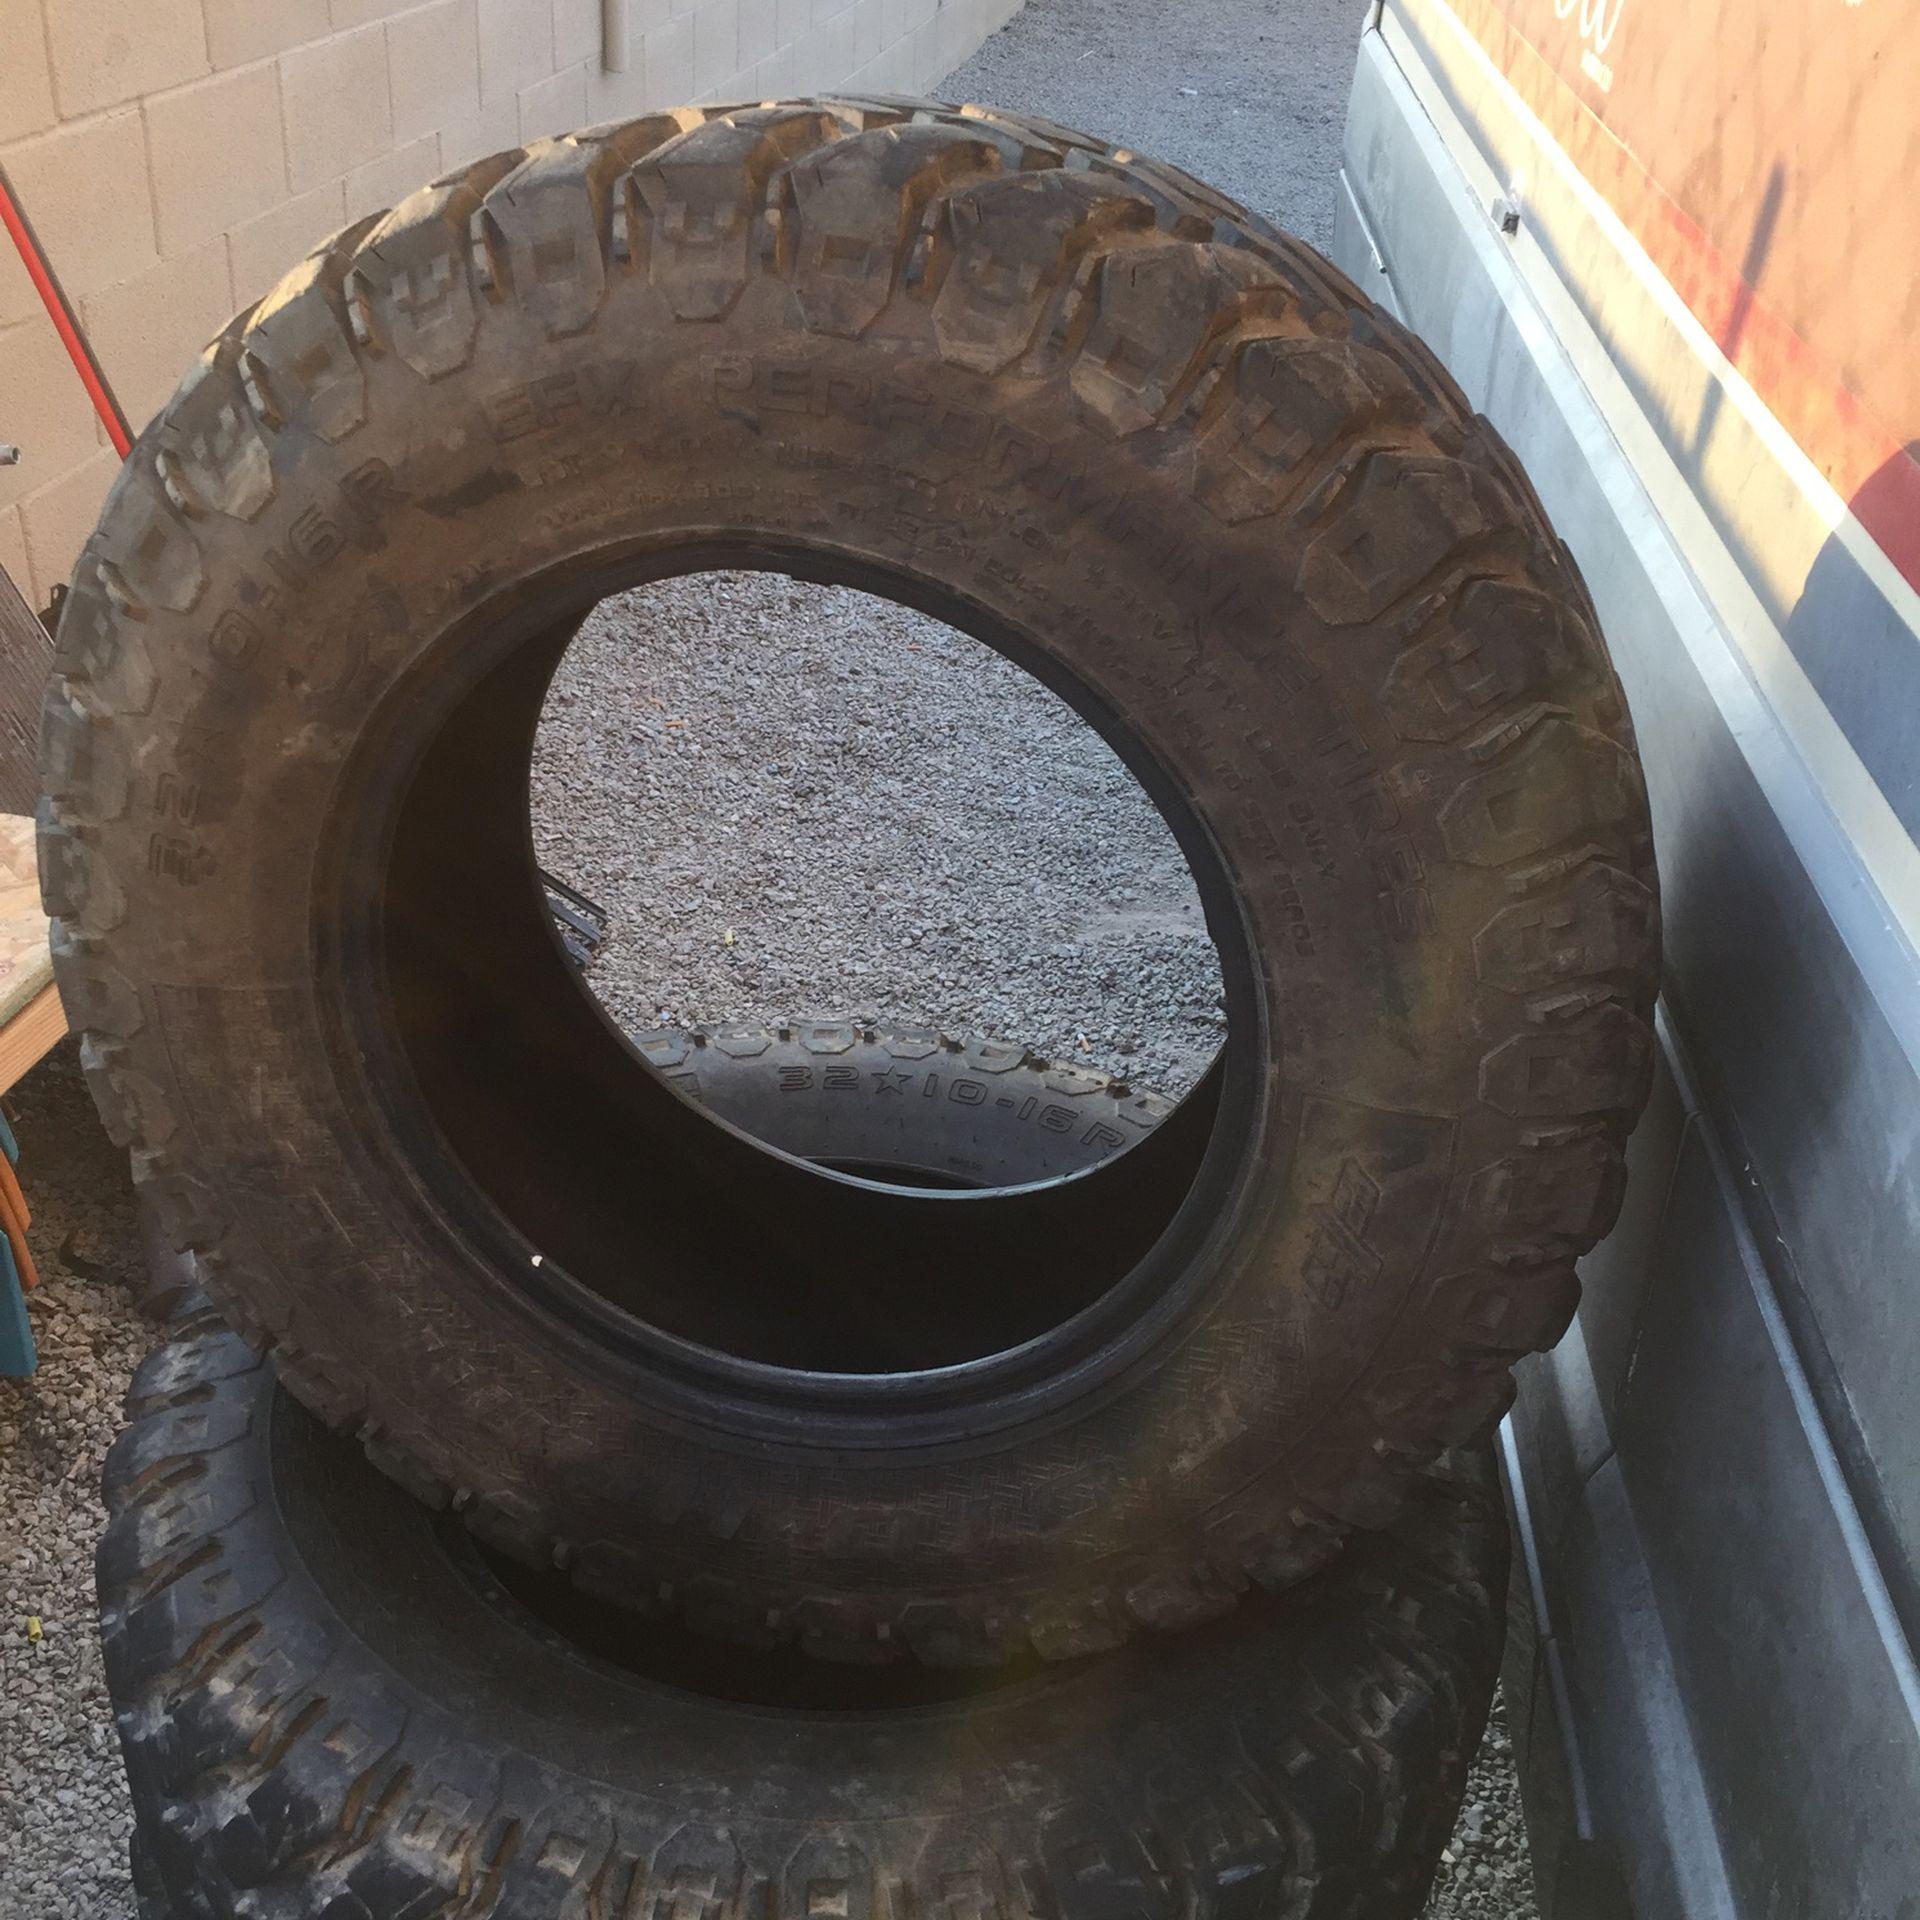 32 10 16 R E Fx Performance Tires